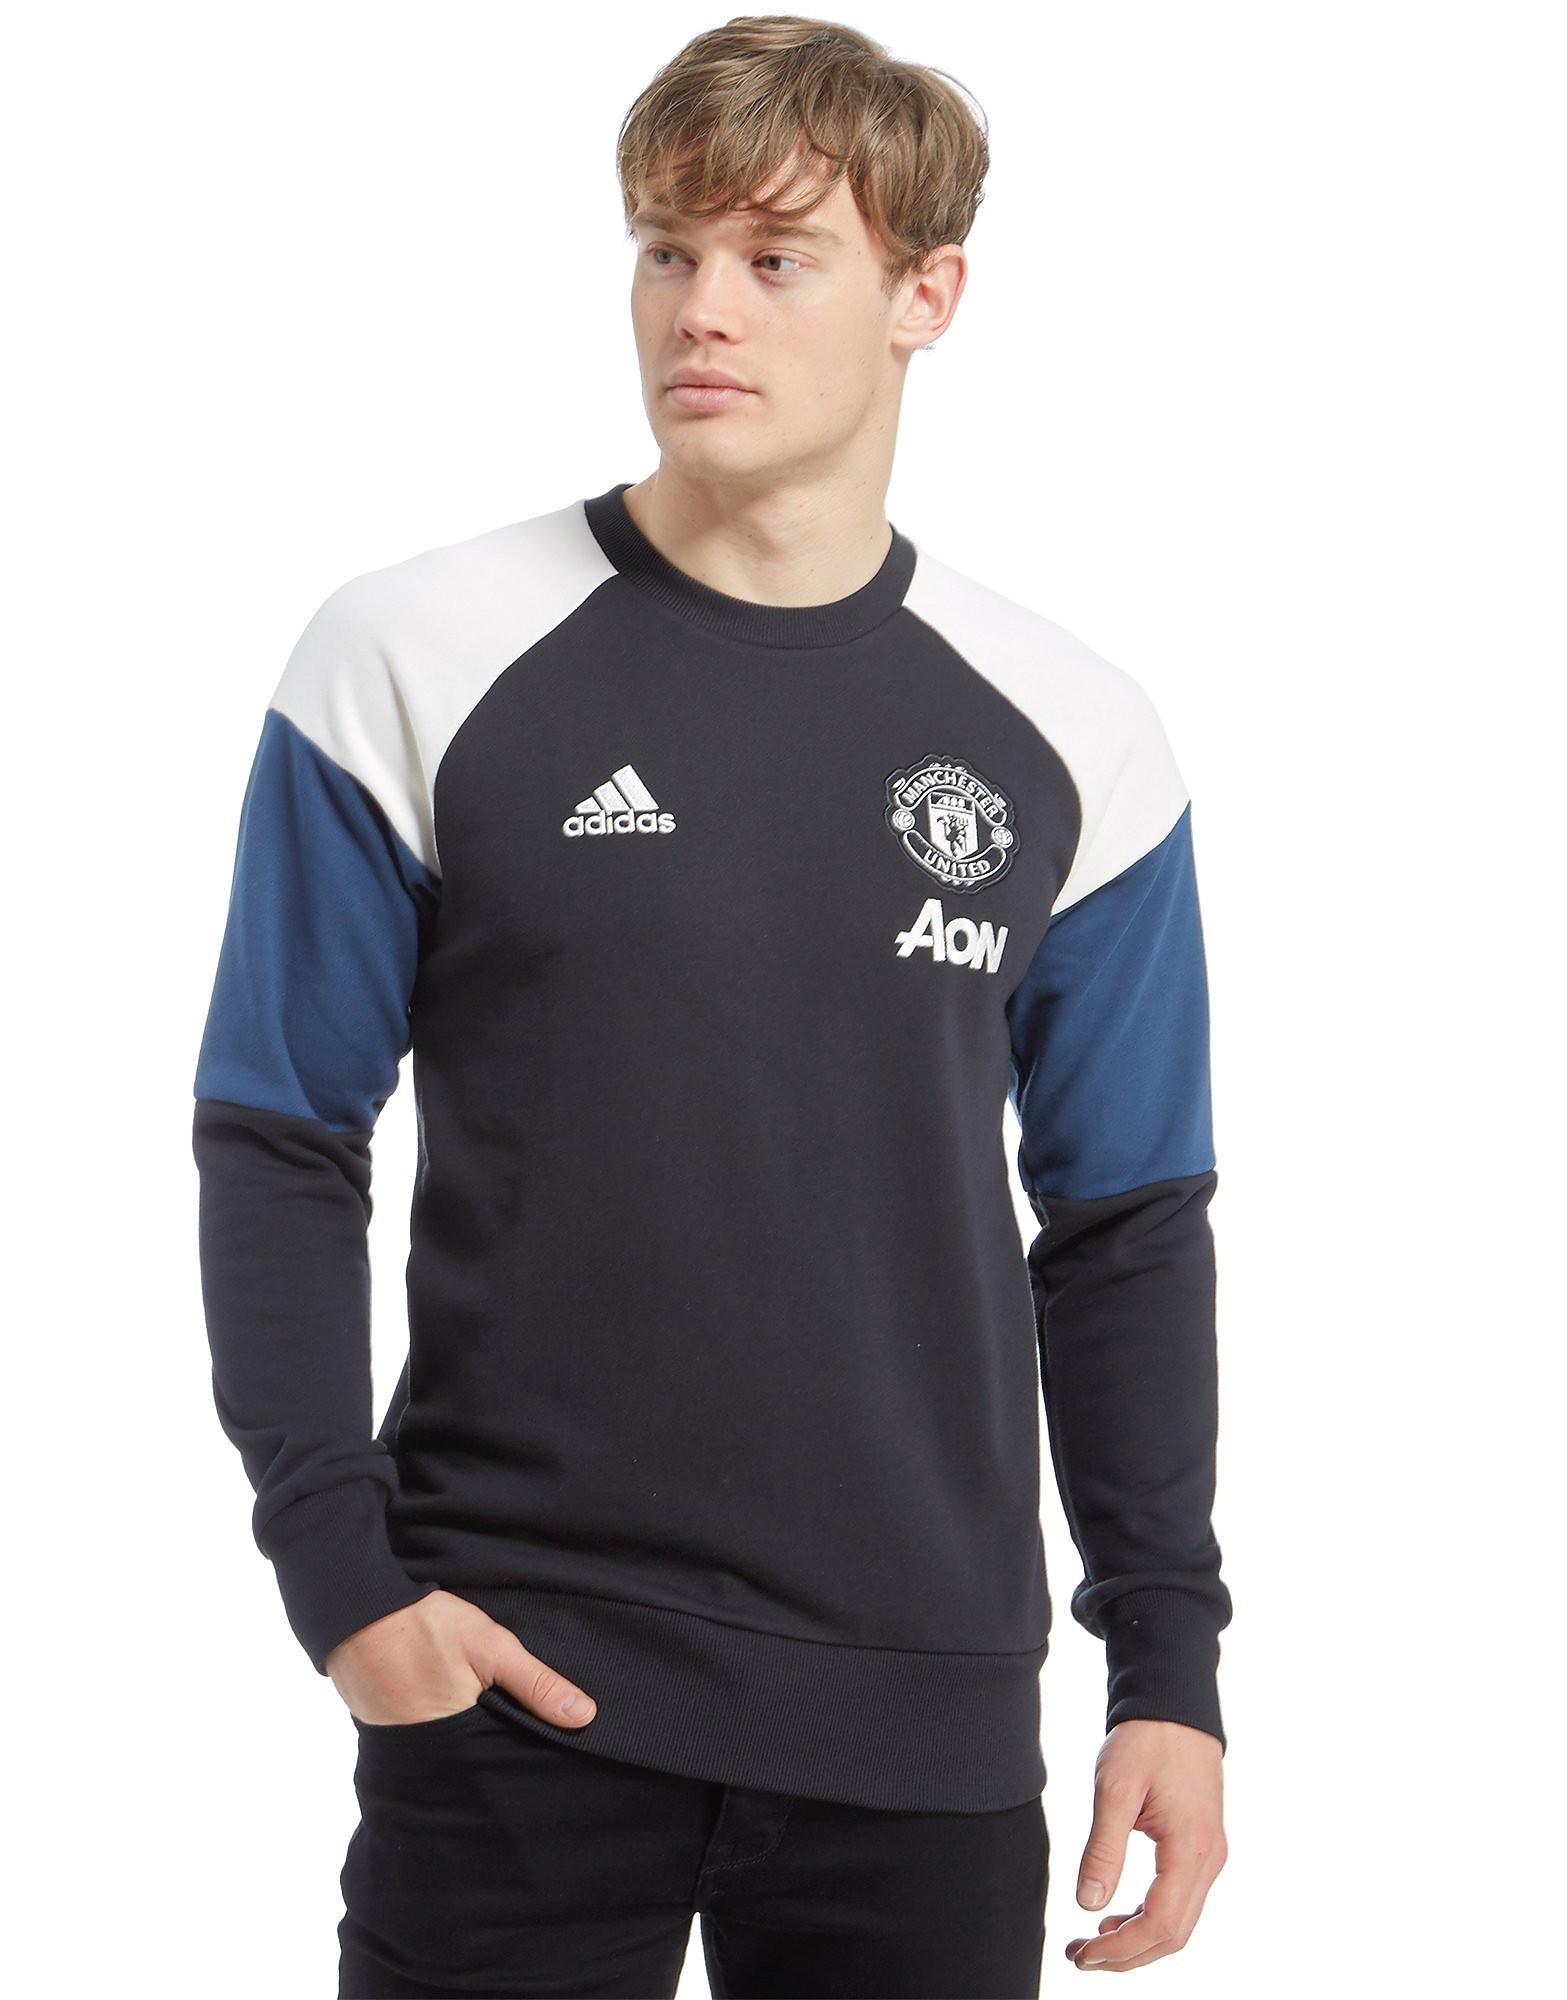 adidas Manchester United FC Sweatshirt Top